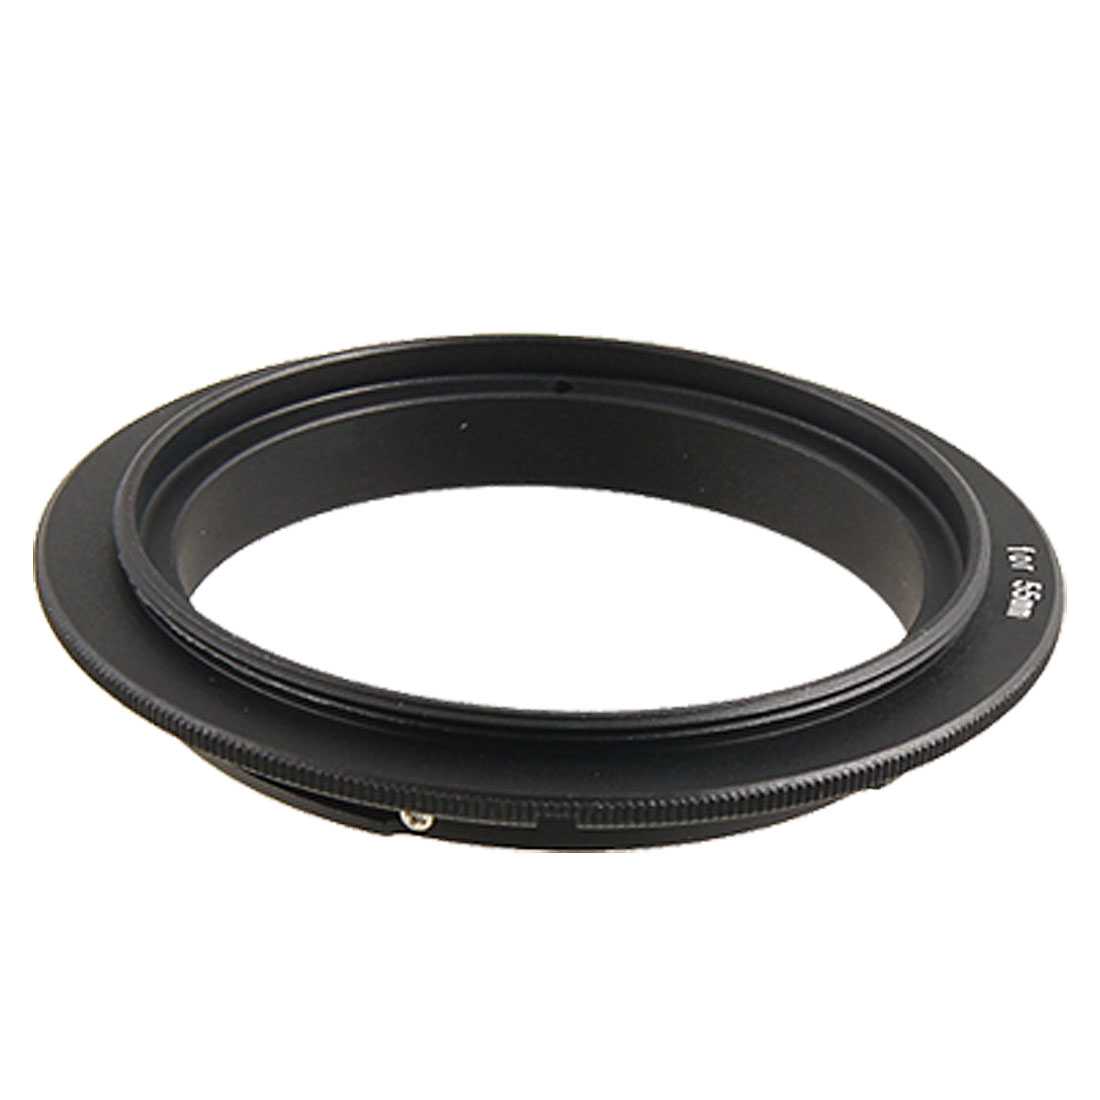 Digital Camera Macro Lens 55mm Reverse Mount Adapter Ring